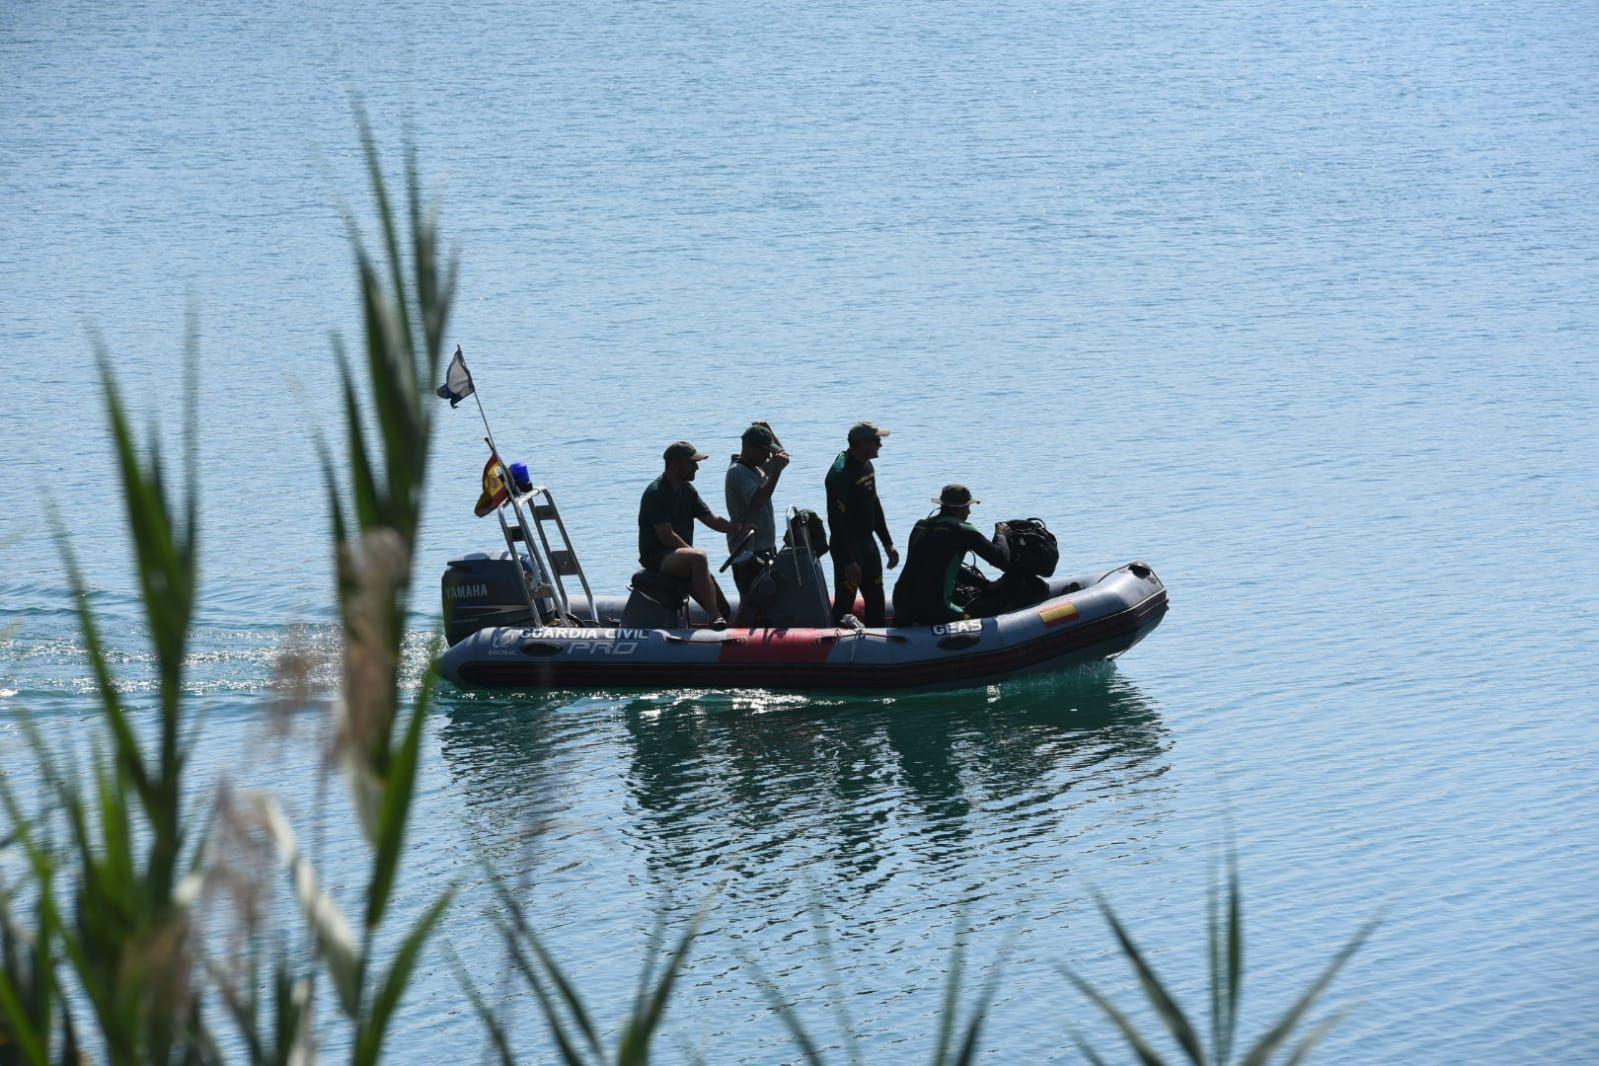 Buzos de la Guardia Civil se suman a la búsqueda del joven desaparecido en el Lago Azul